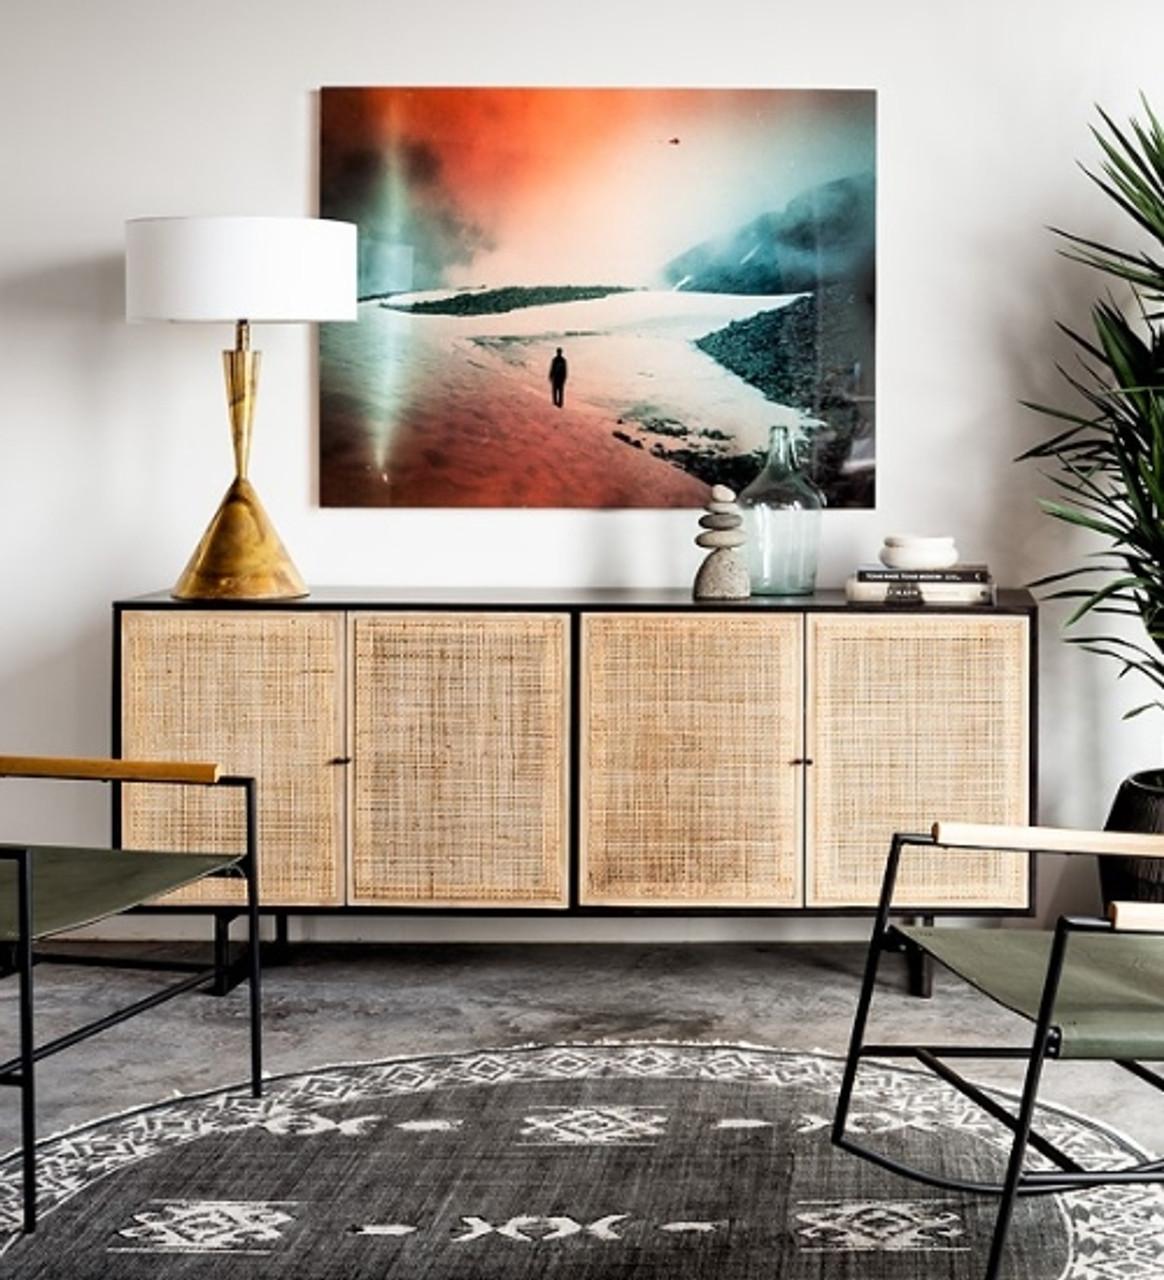 Trend Alert: Woven Cane & Wicker Furniture